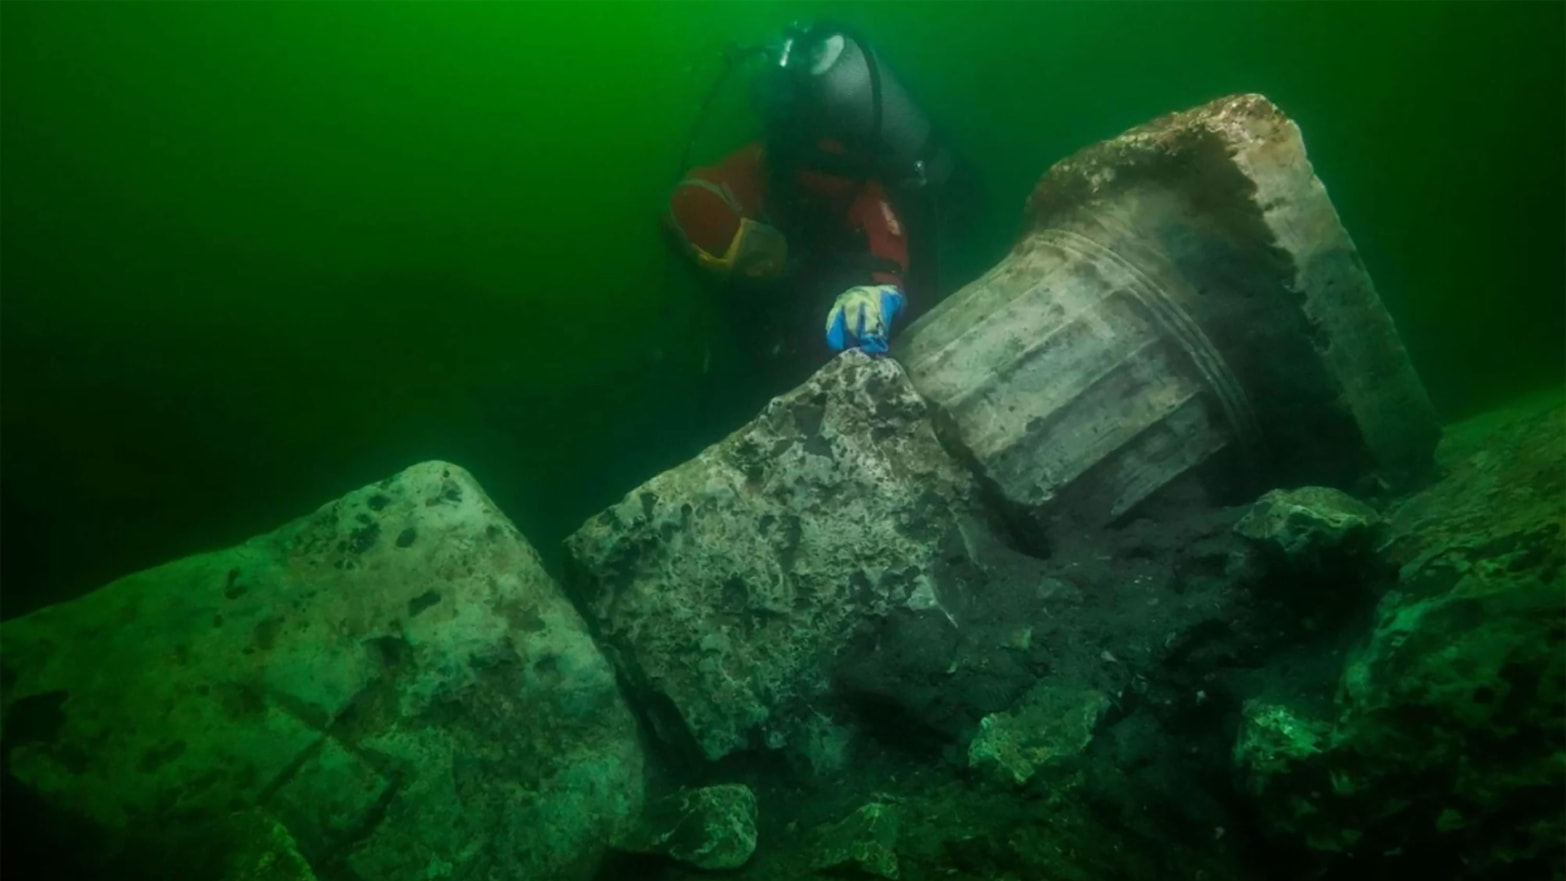 Heracleion: Treasure Trove Discovered at Egypt's Atlantis